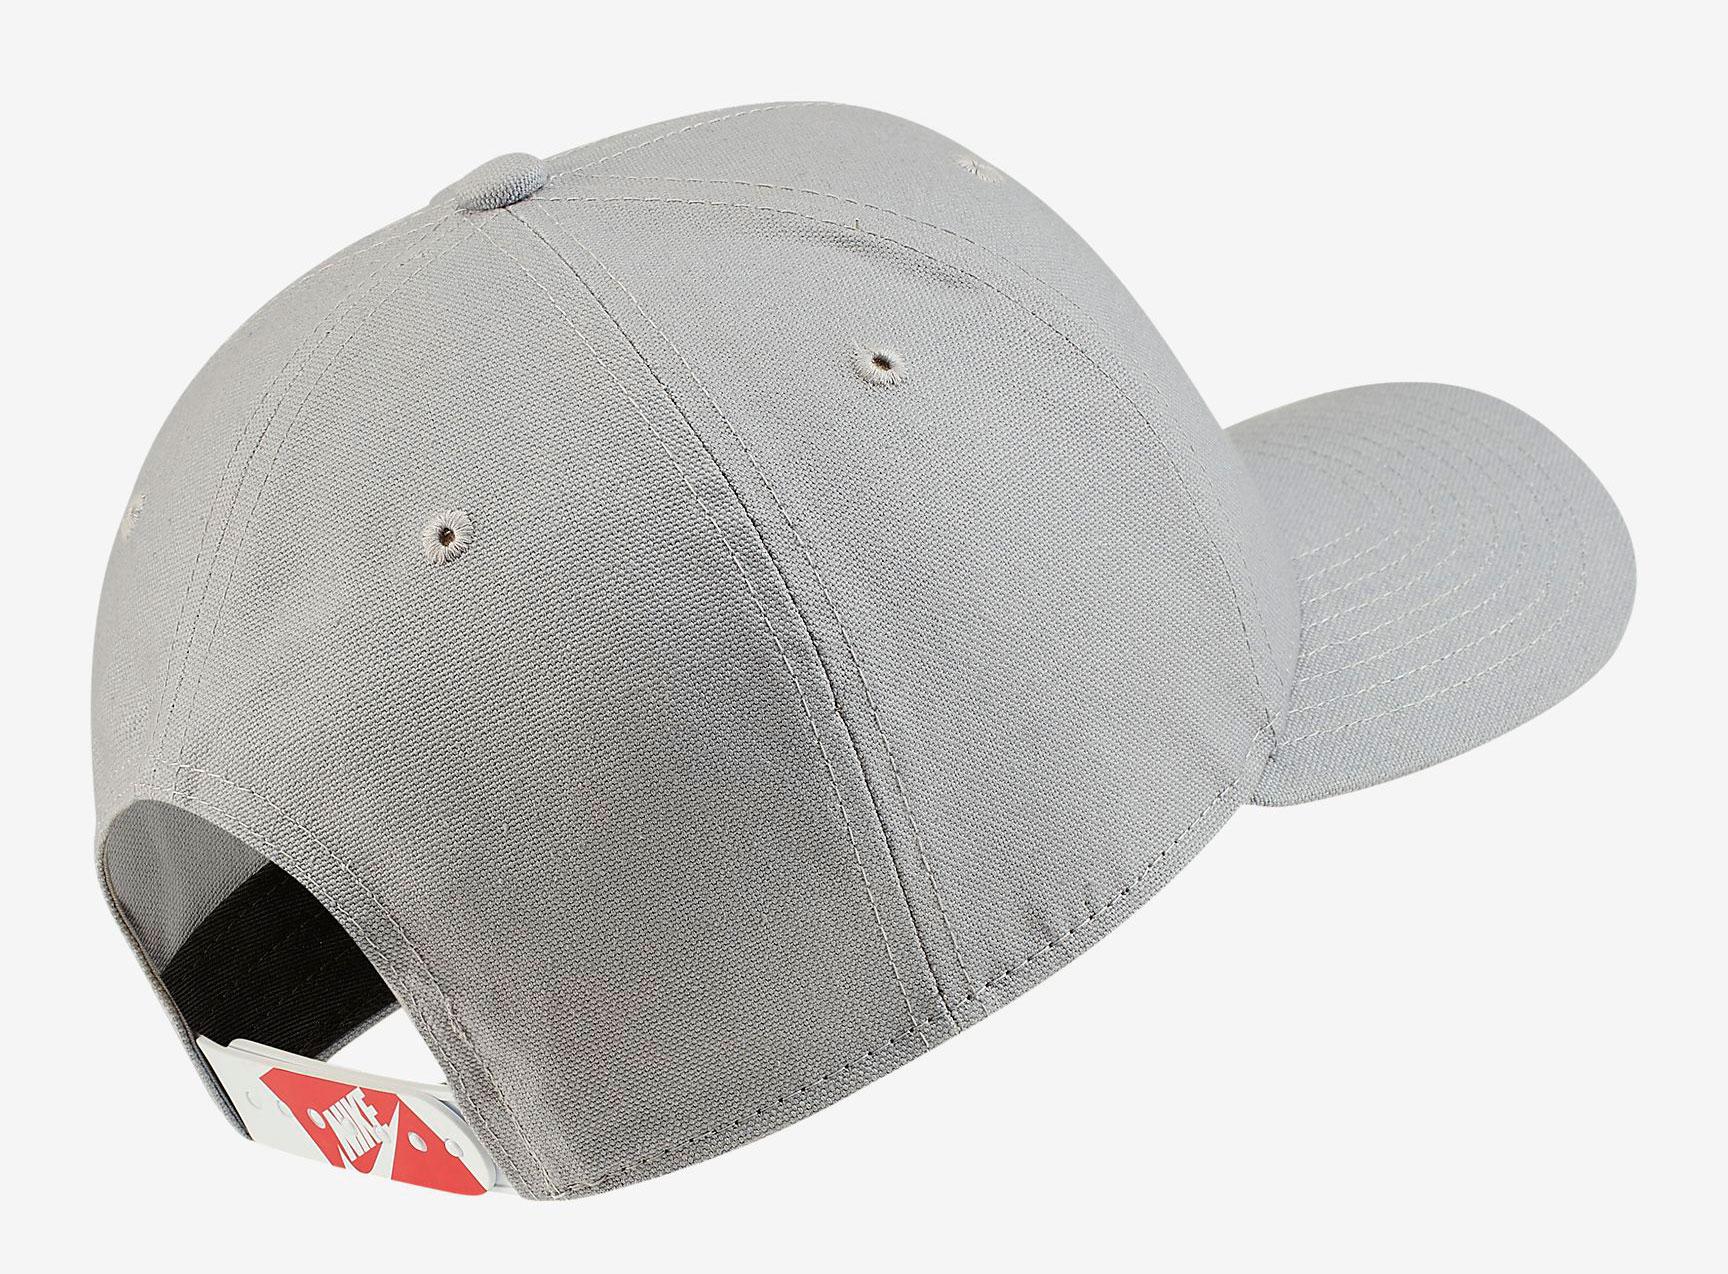 nike-just-do-it-grey-snapback-hat-2